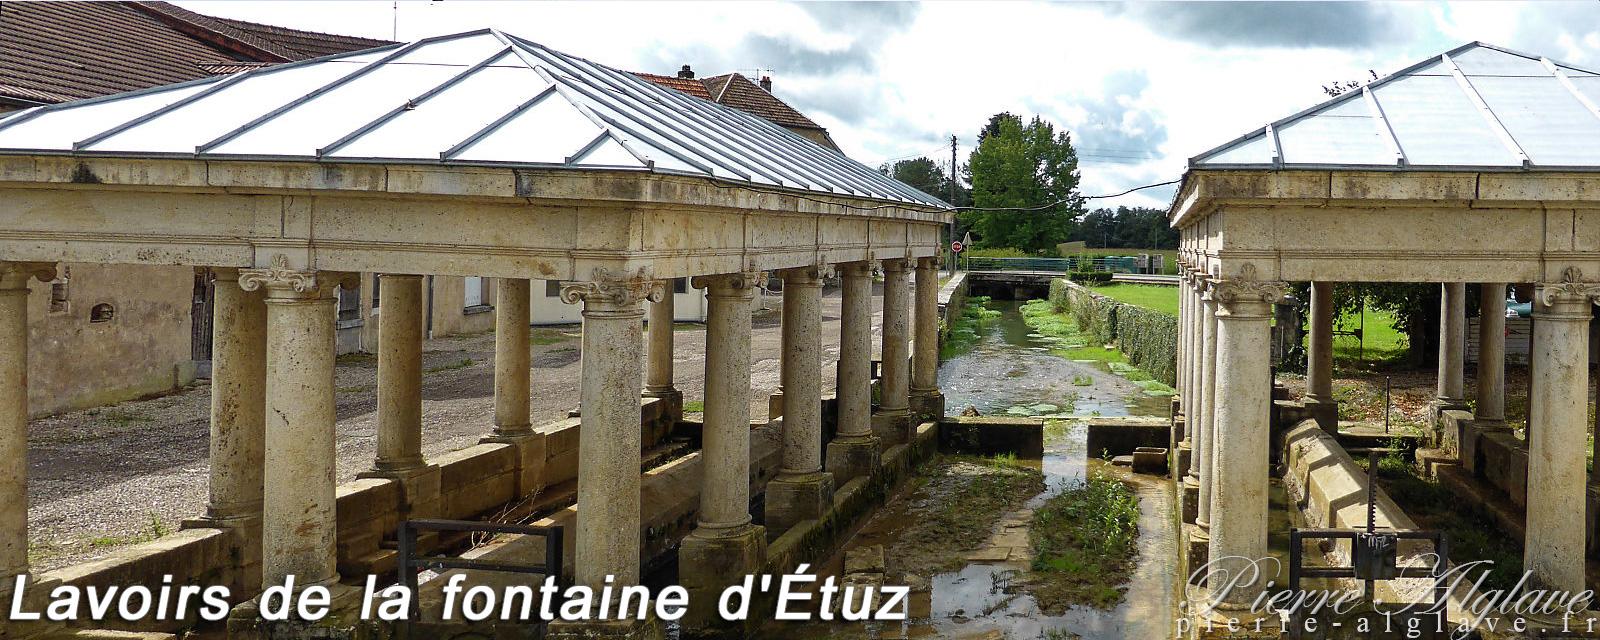 Vers Devecey-Besançon